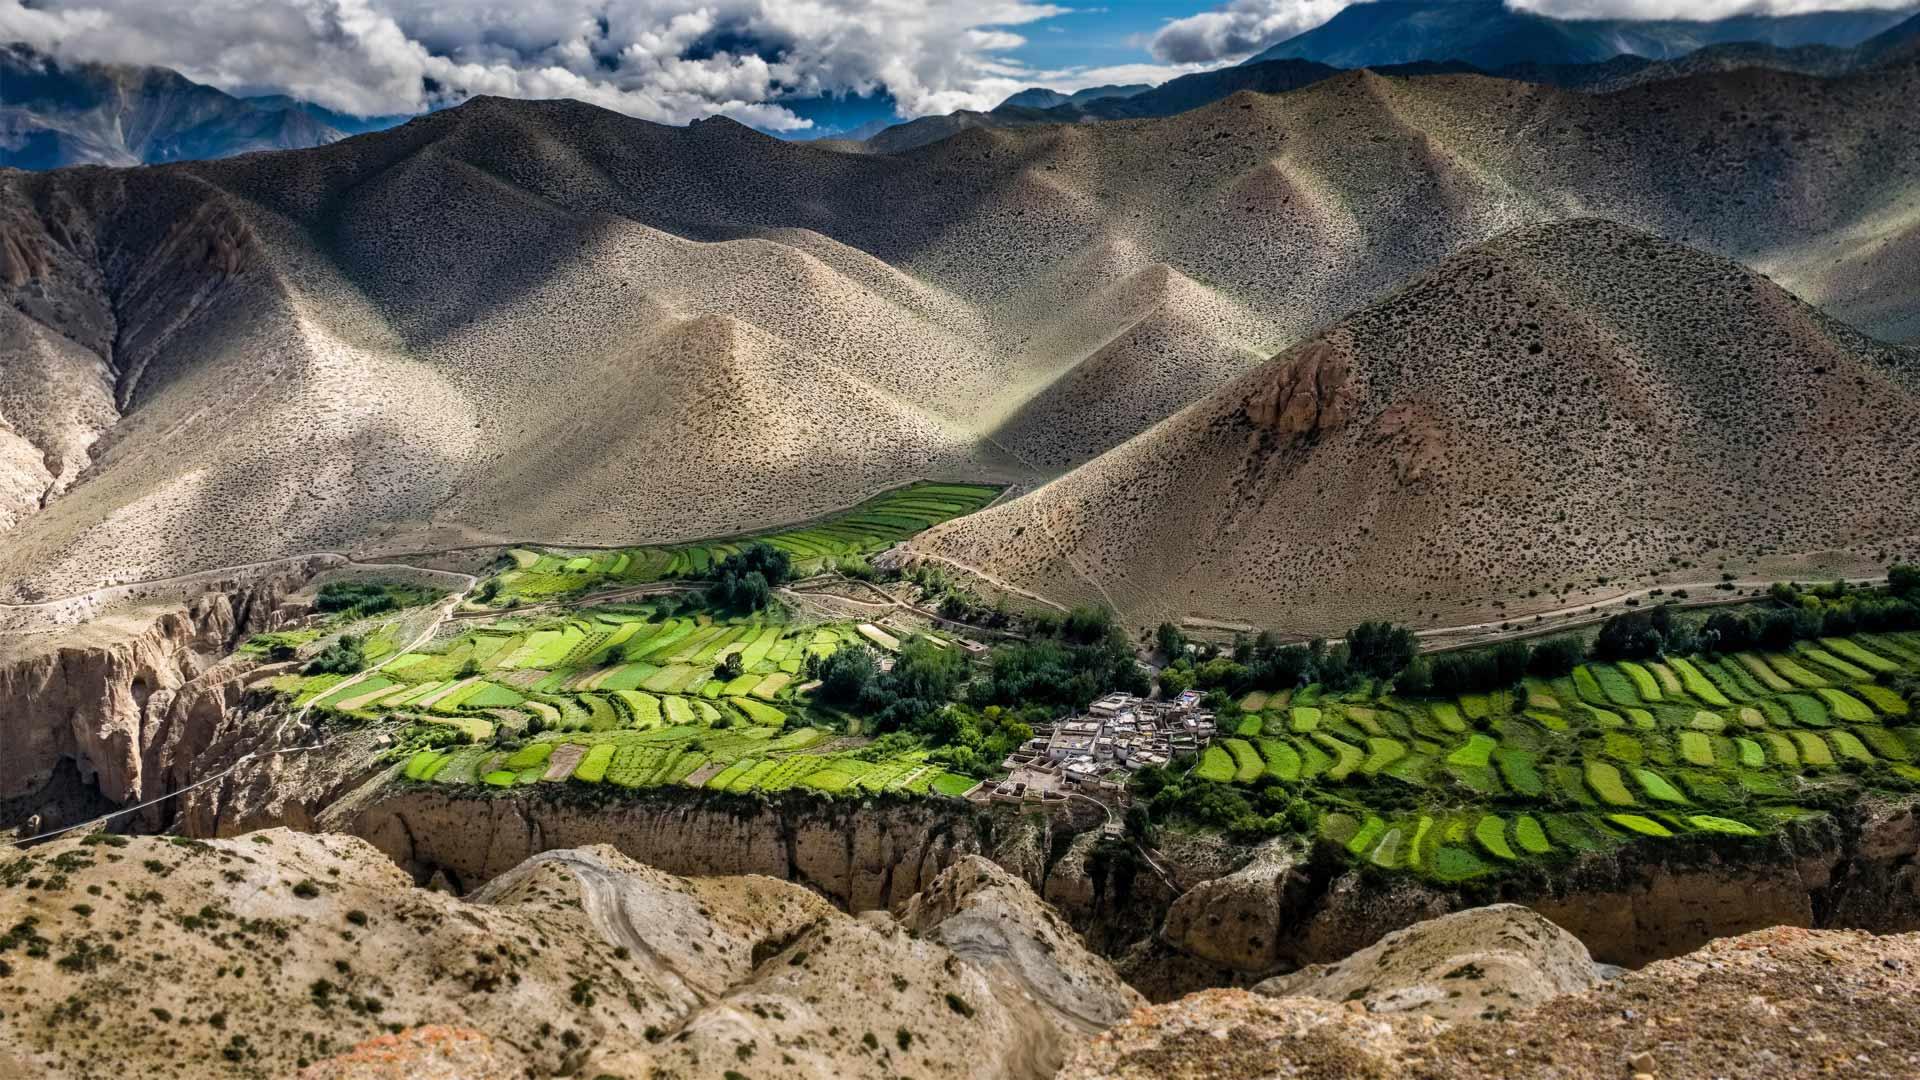 Ghyakar village, Upper Mustang, Nepal (© Frank Bienewald/Alamy)(Bing United States)